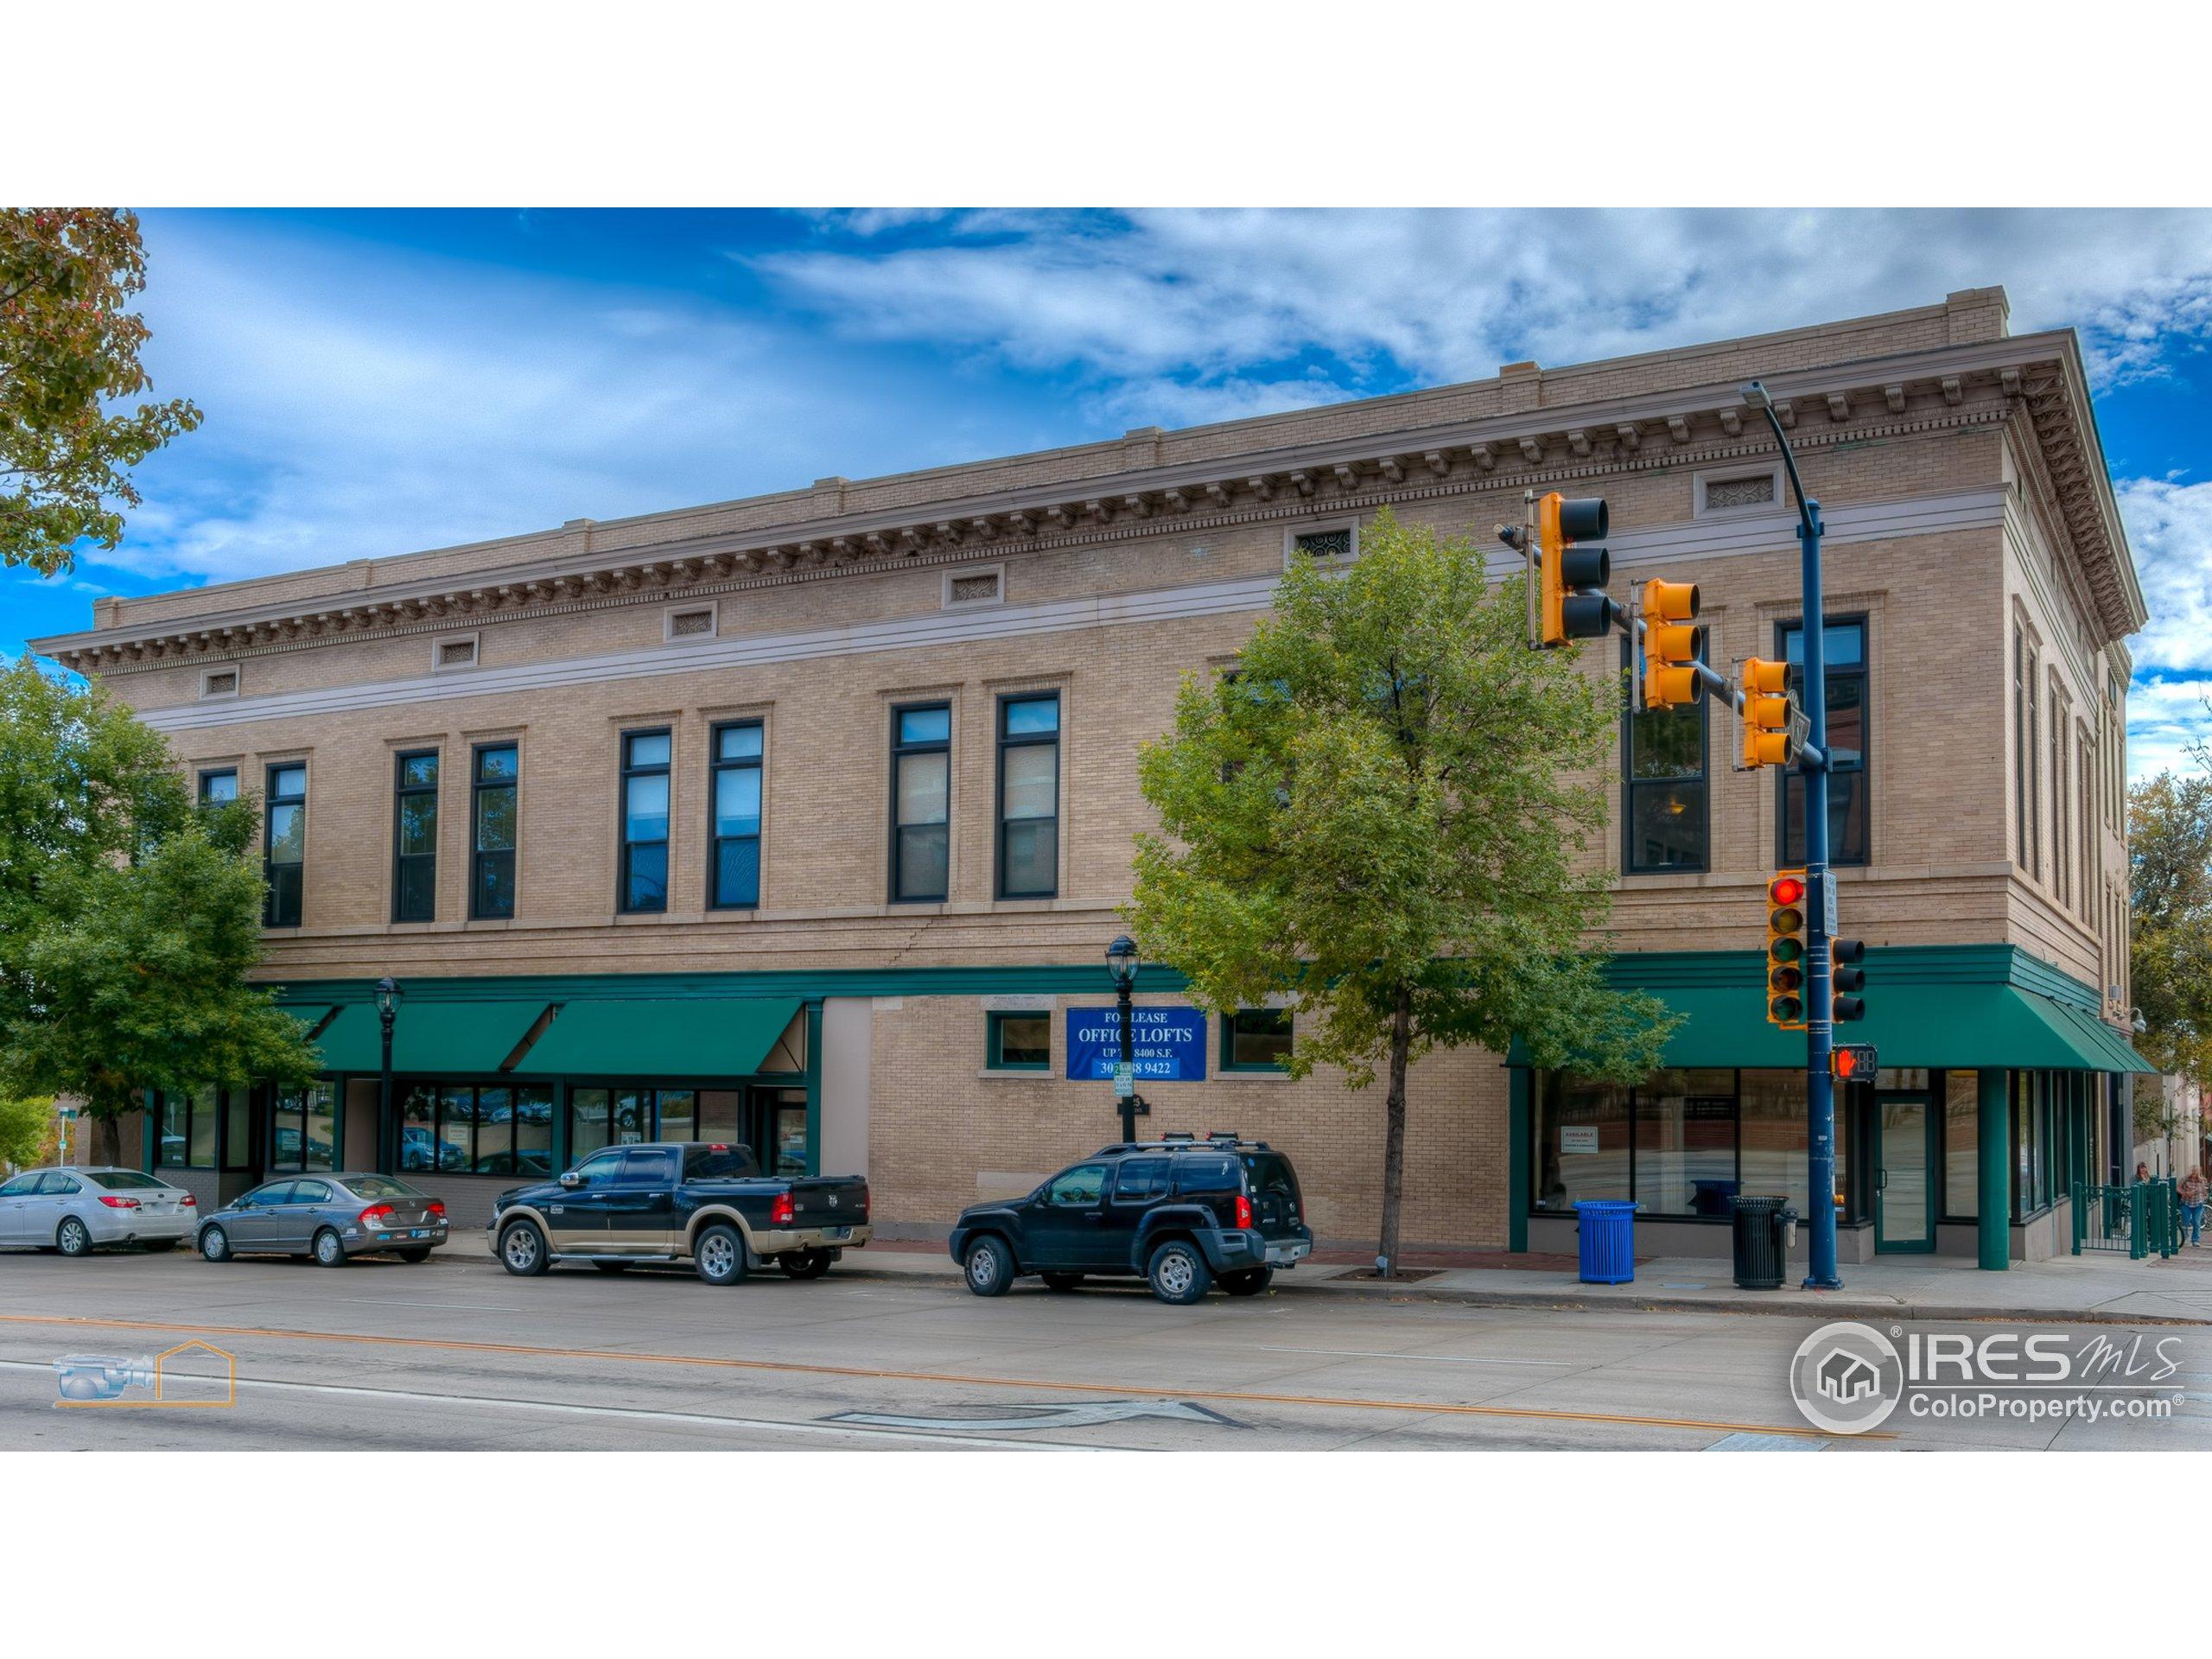 525 3rd Ave, Longmont CO 80501 - Photo 2